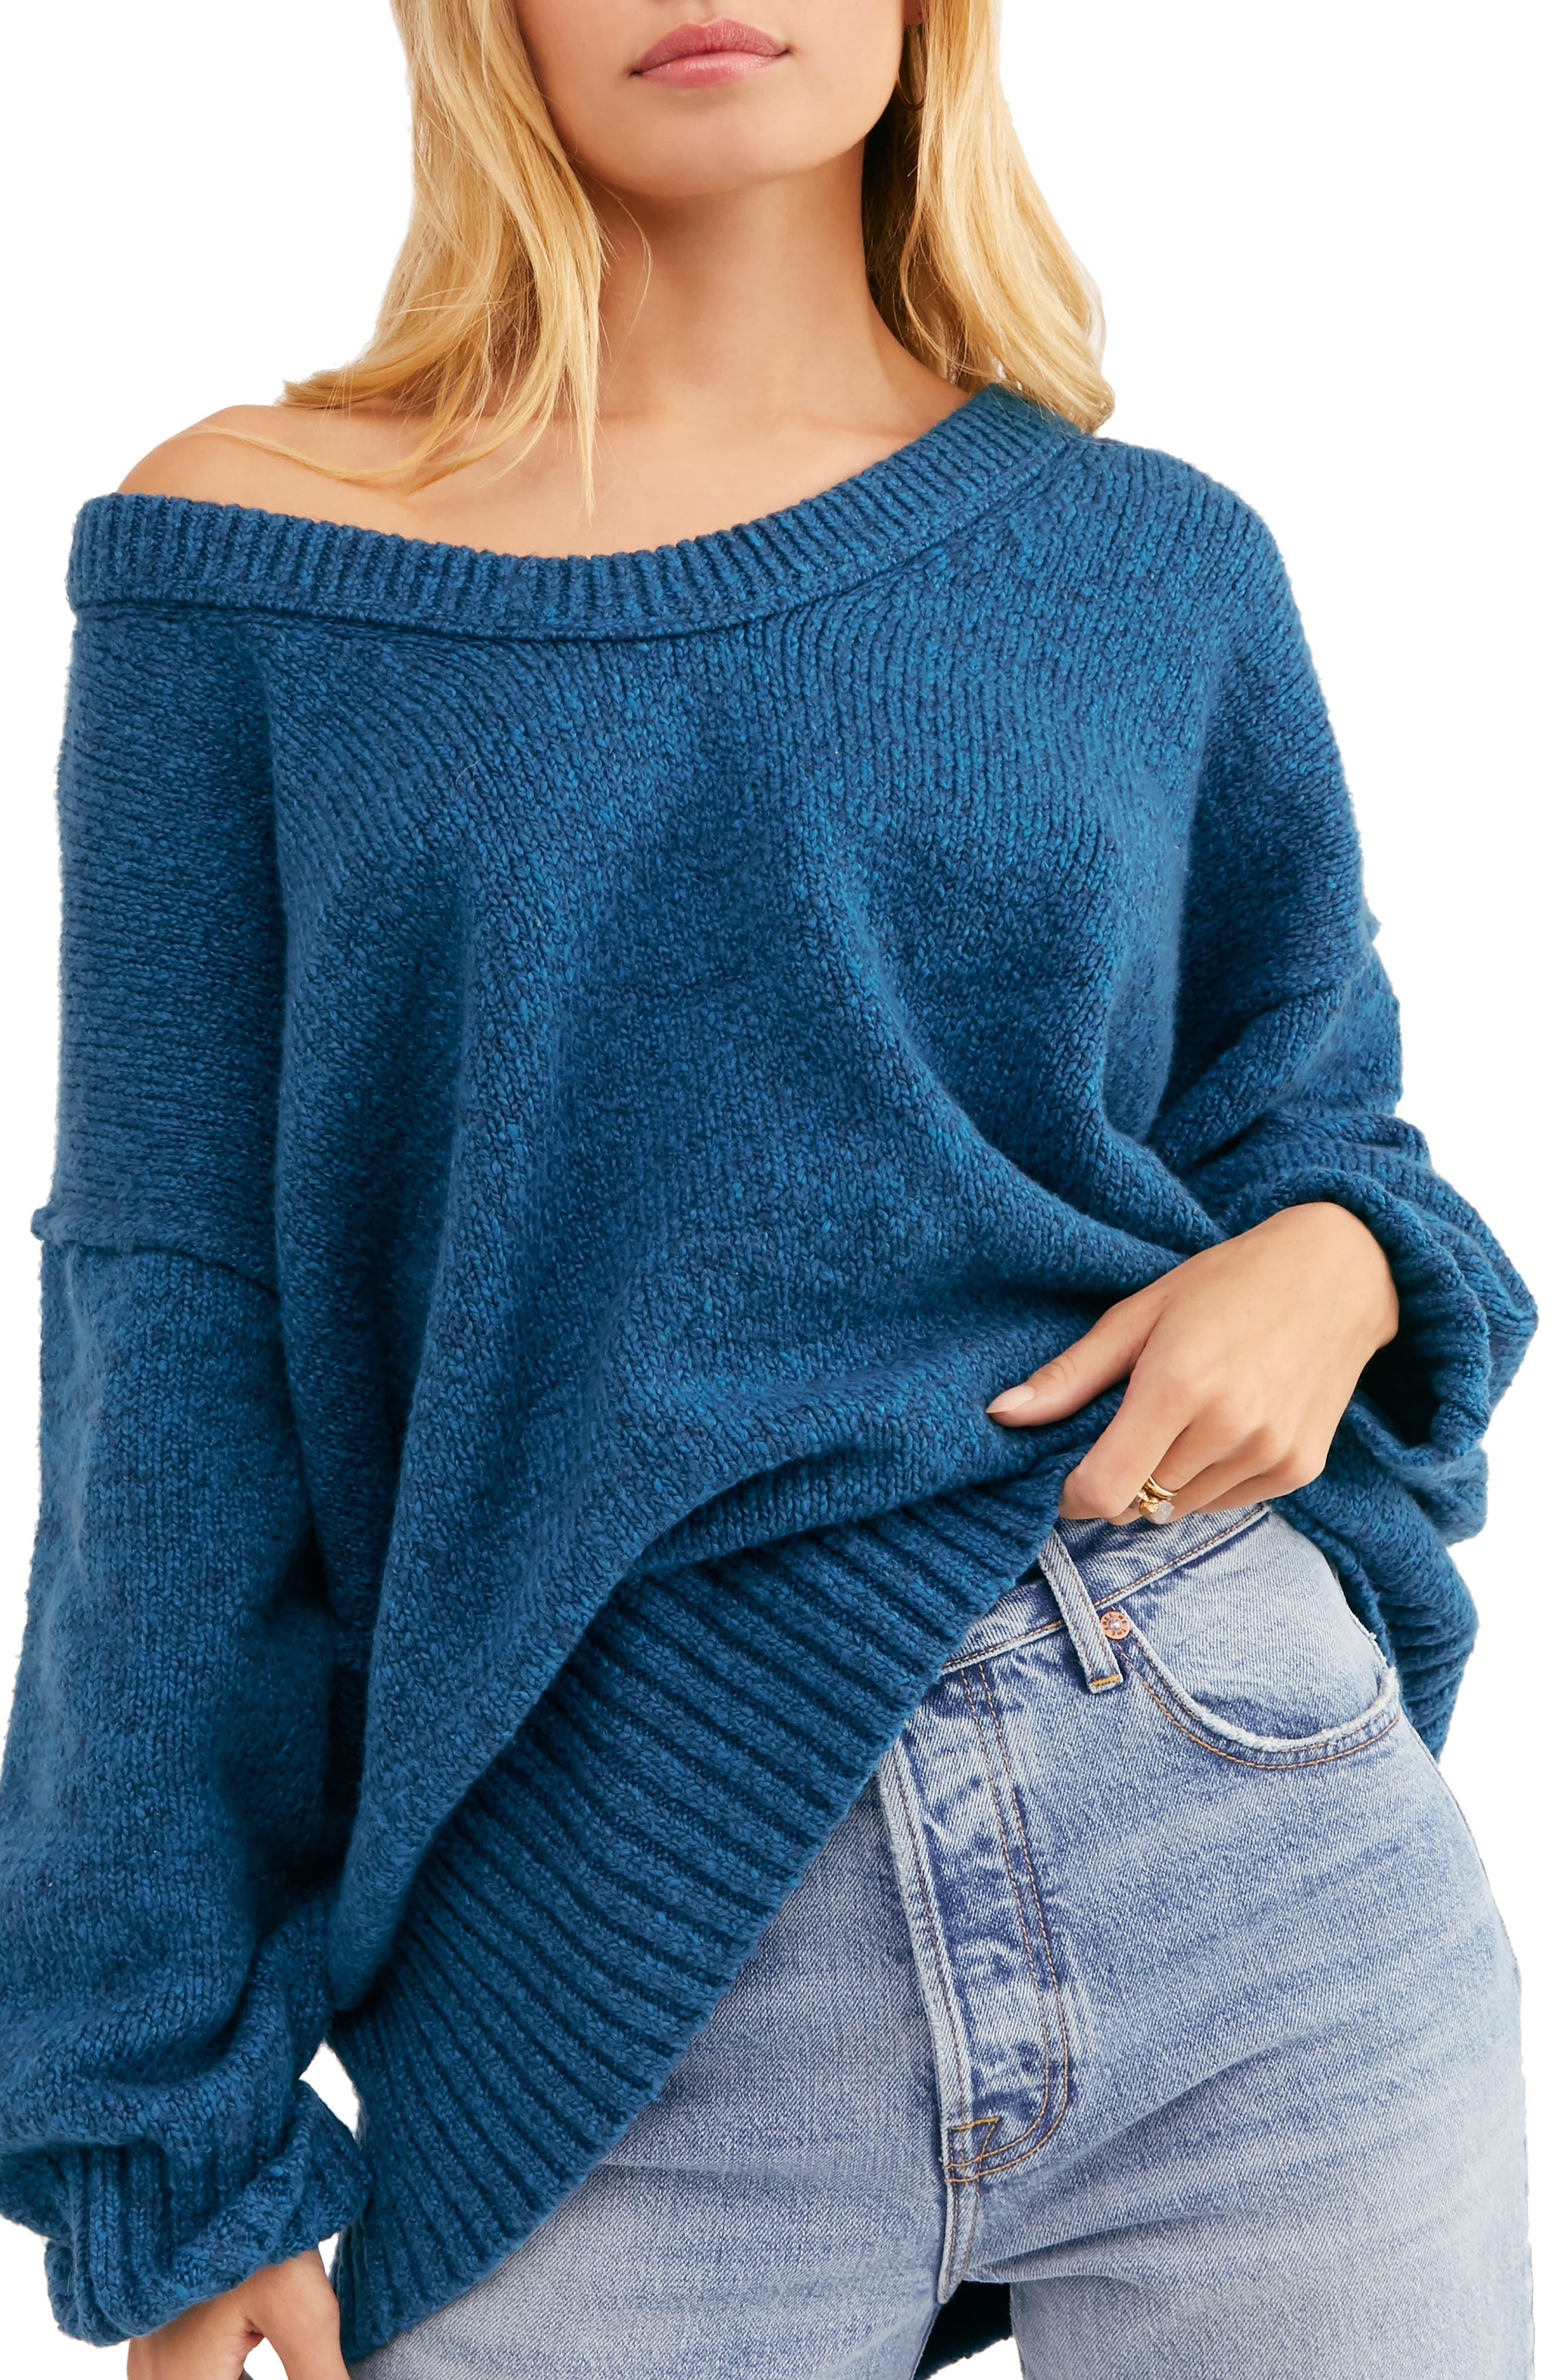 Brookside Sweater